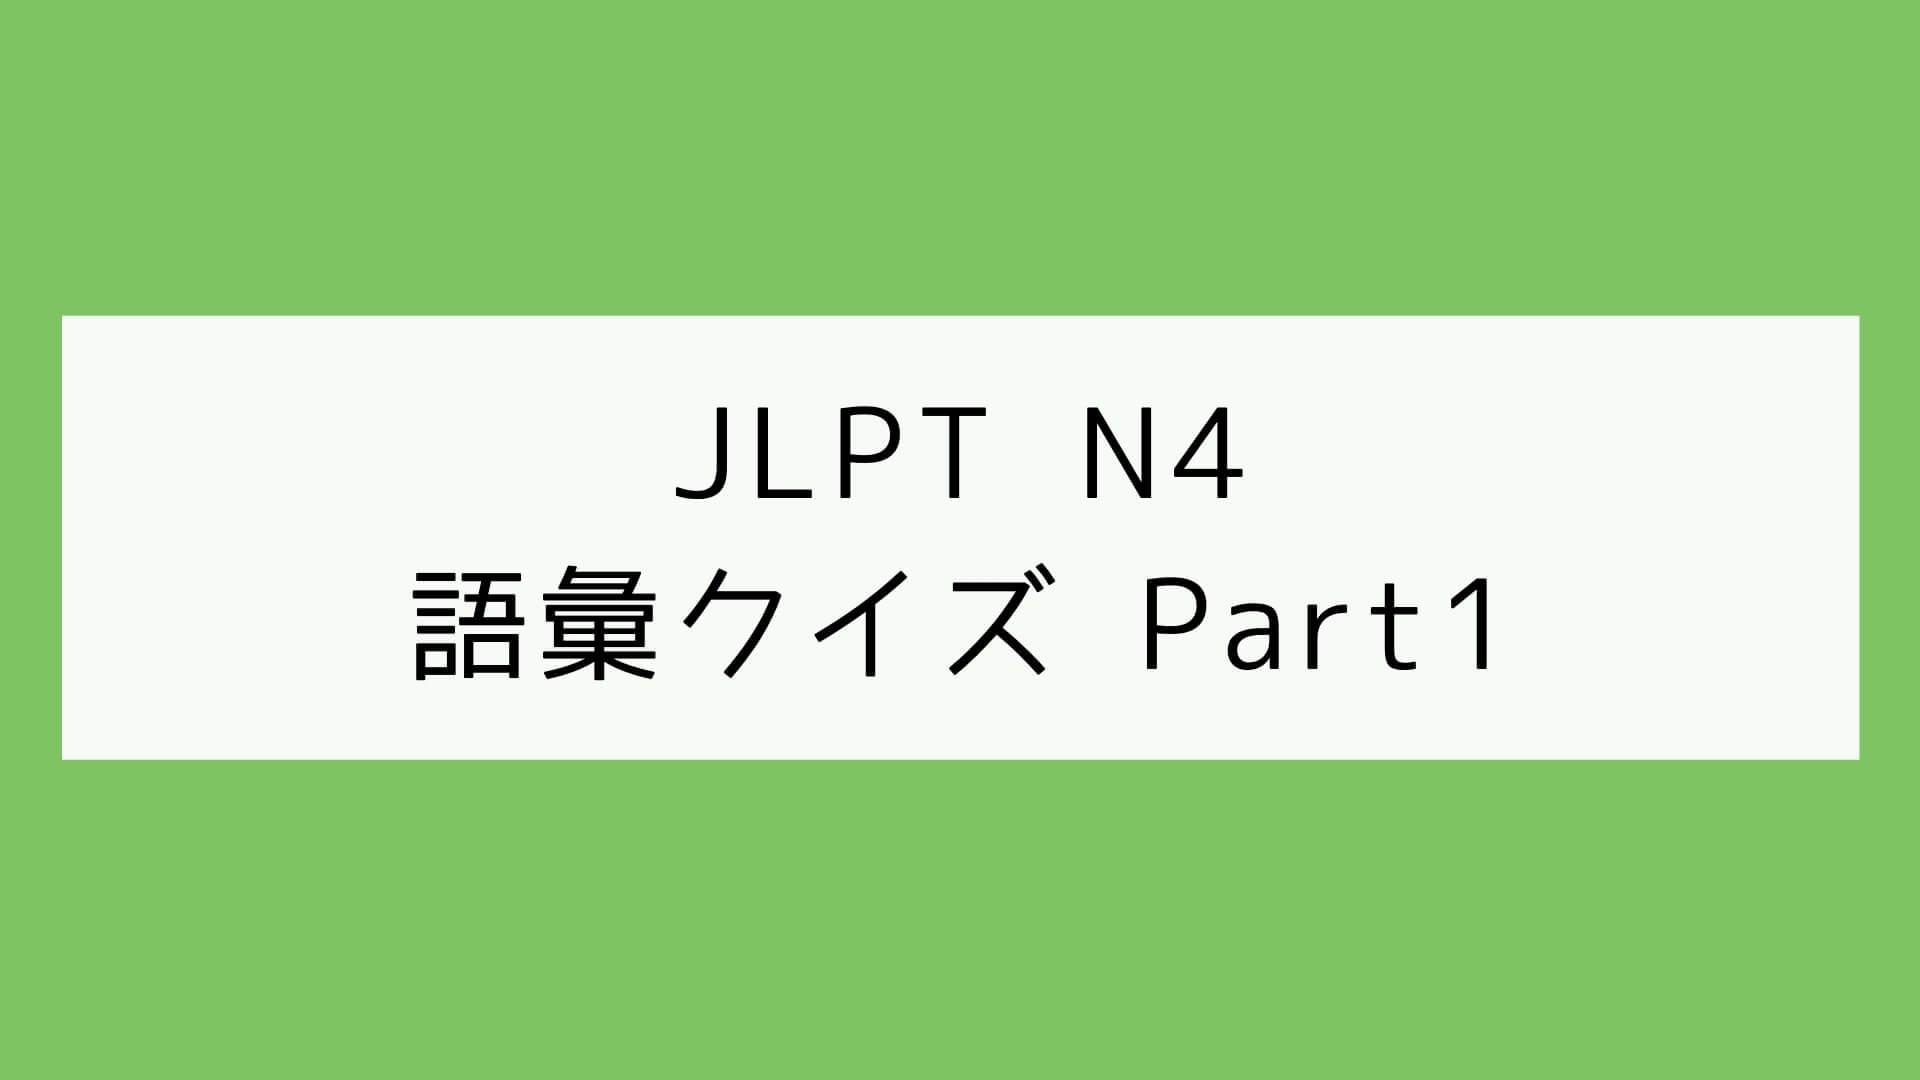 【JLPT N4】語彙クイズ Part1